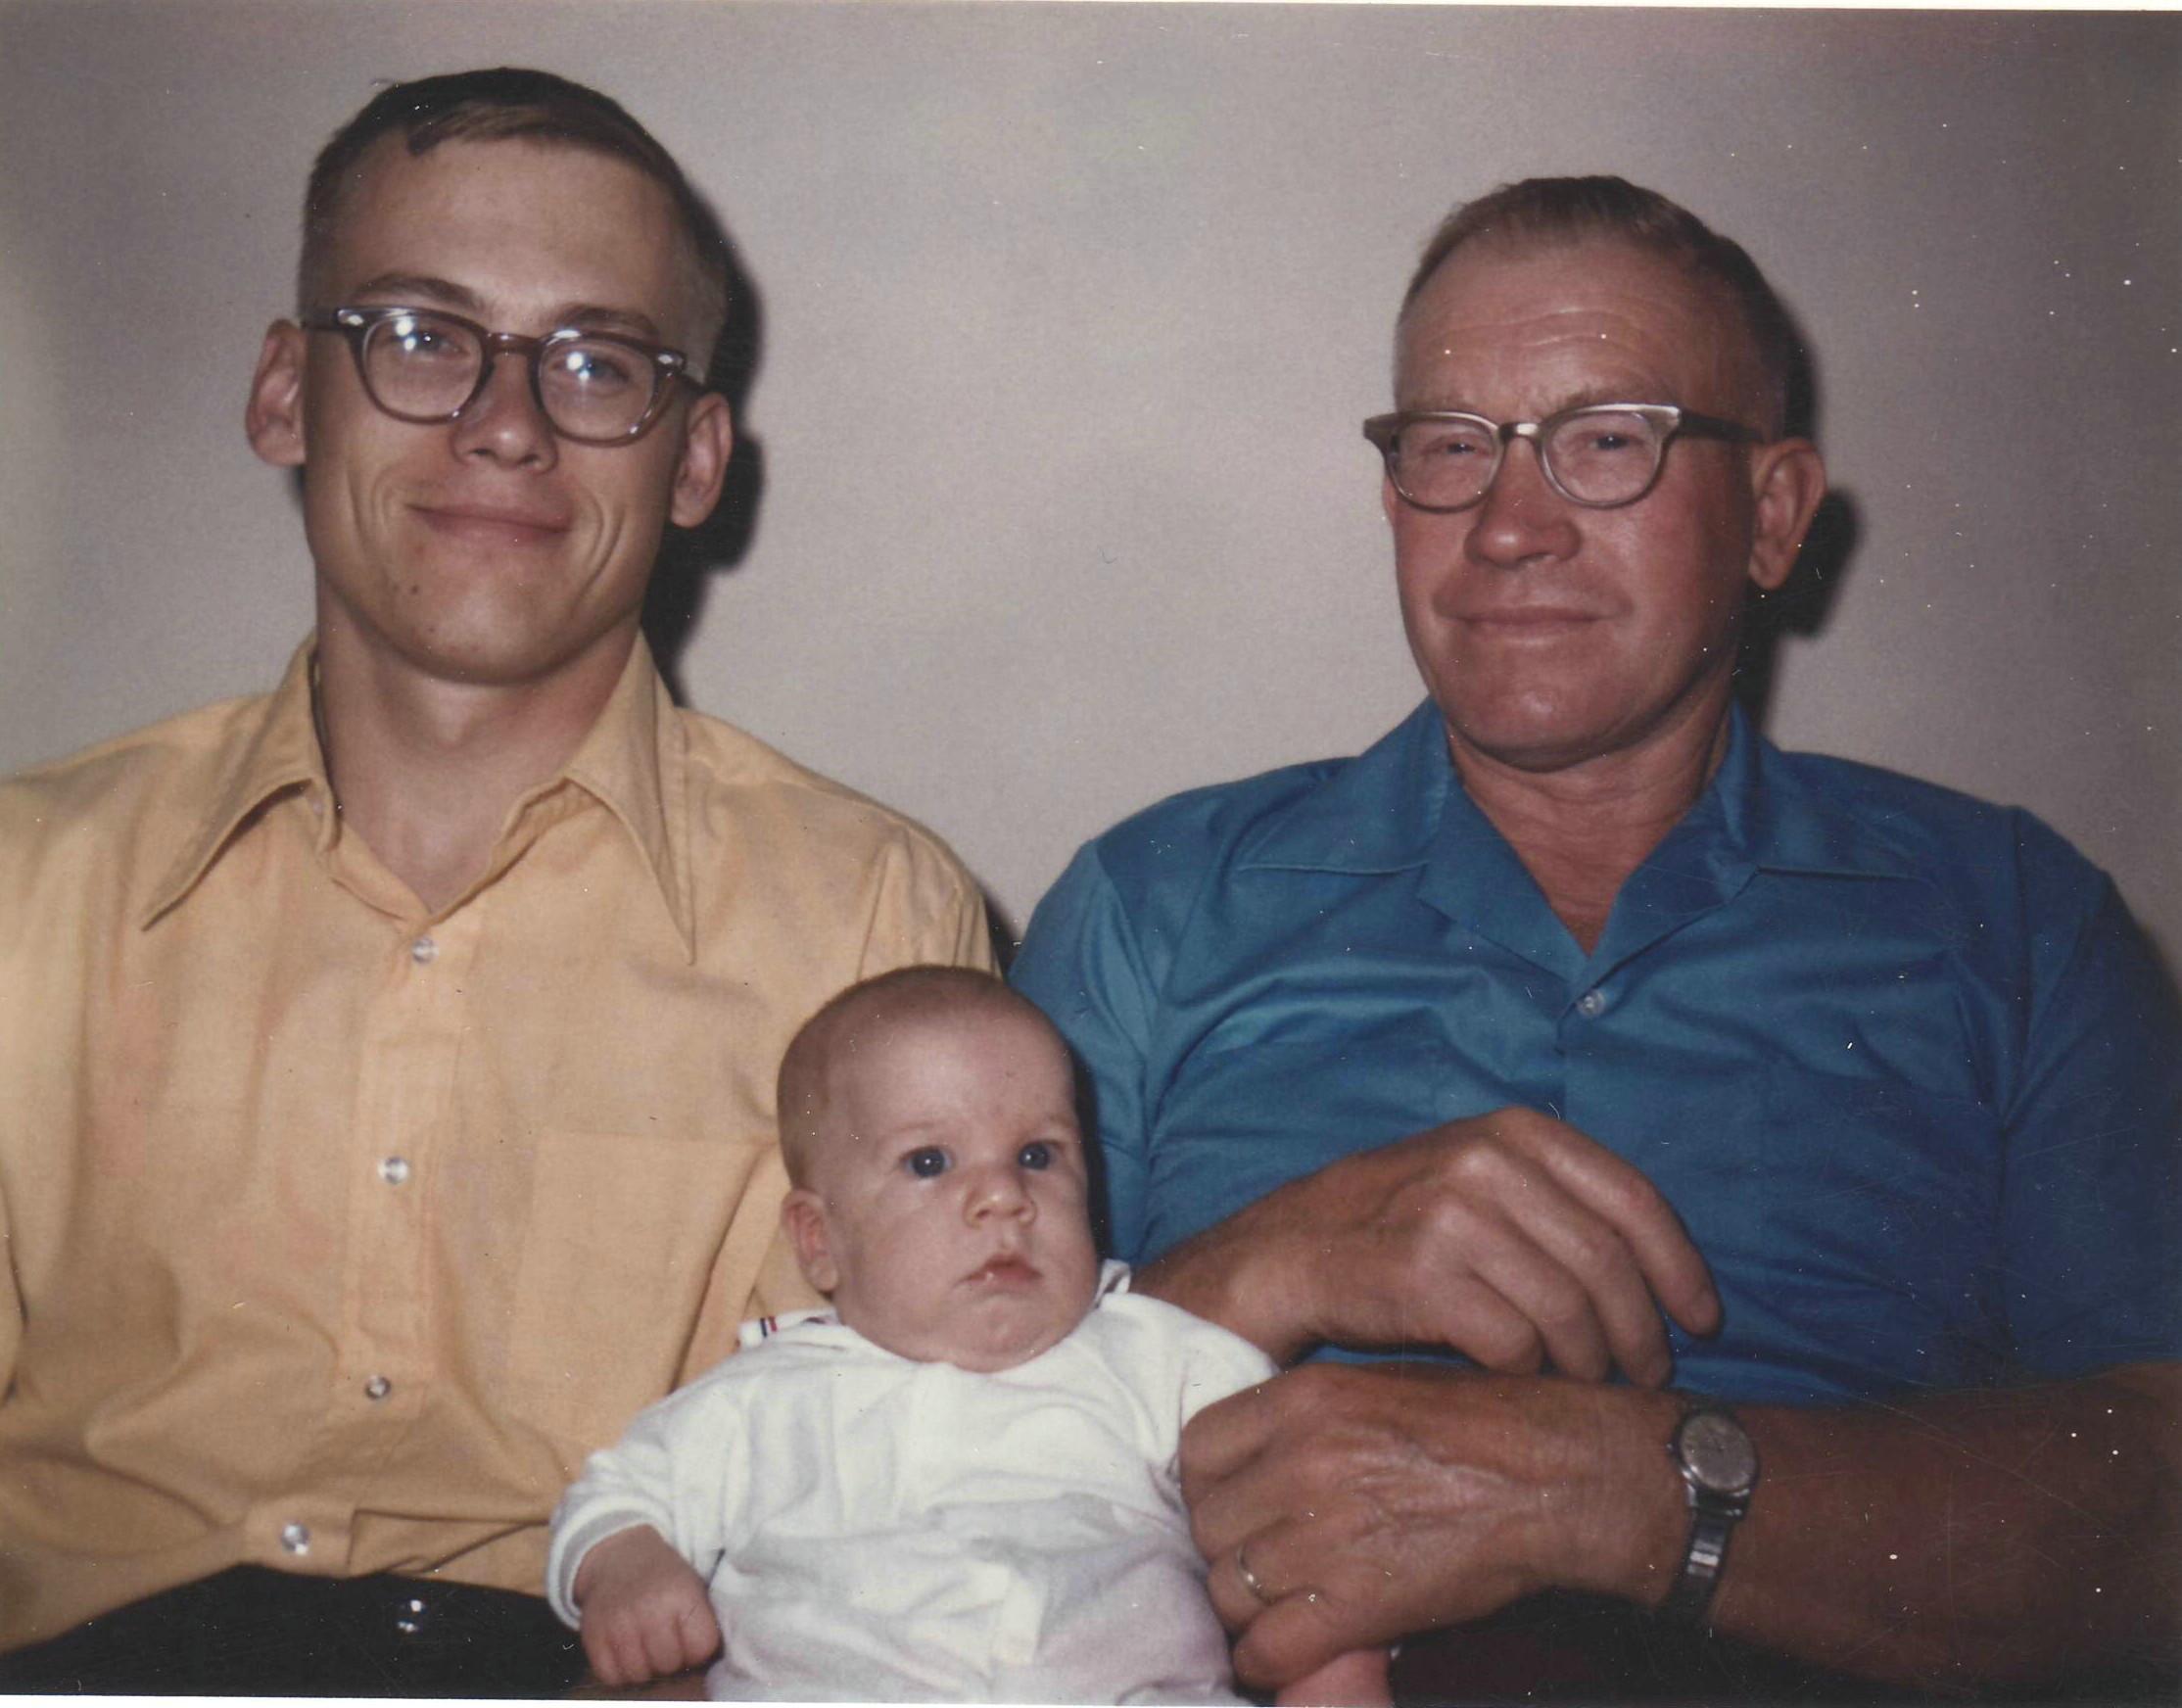 3 generations of Koelle men - Delbert, Richard, and Karl